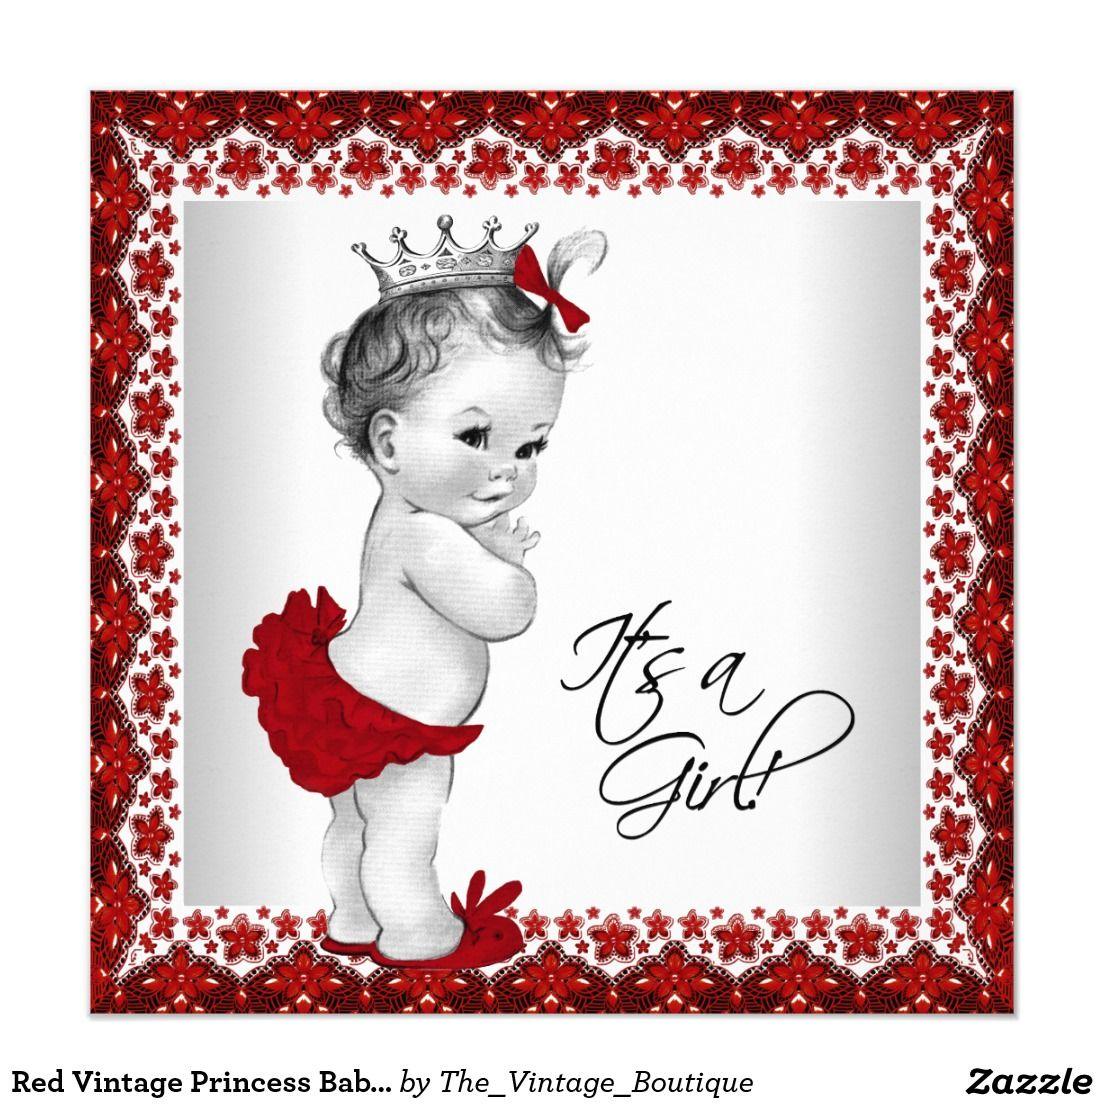 Red Vintage Princess Baby Shower Card | Vintage princess, Princess ...